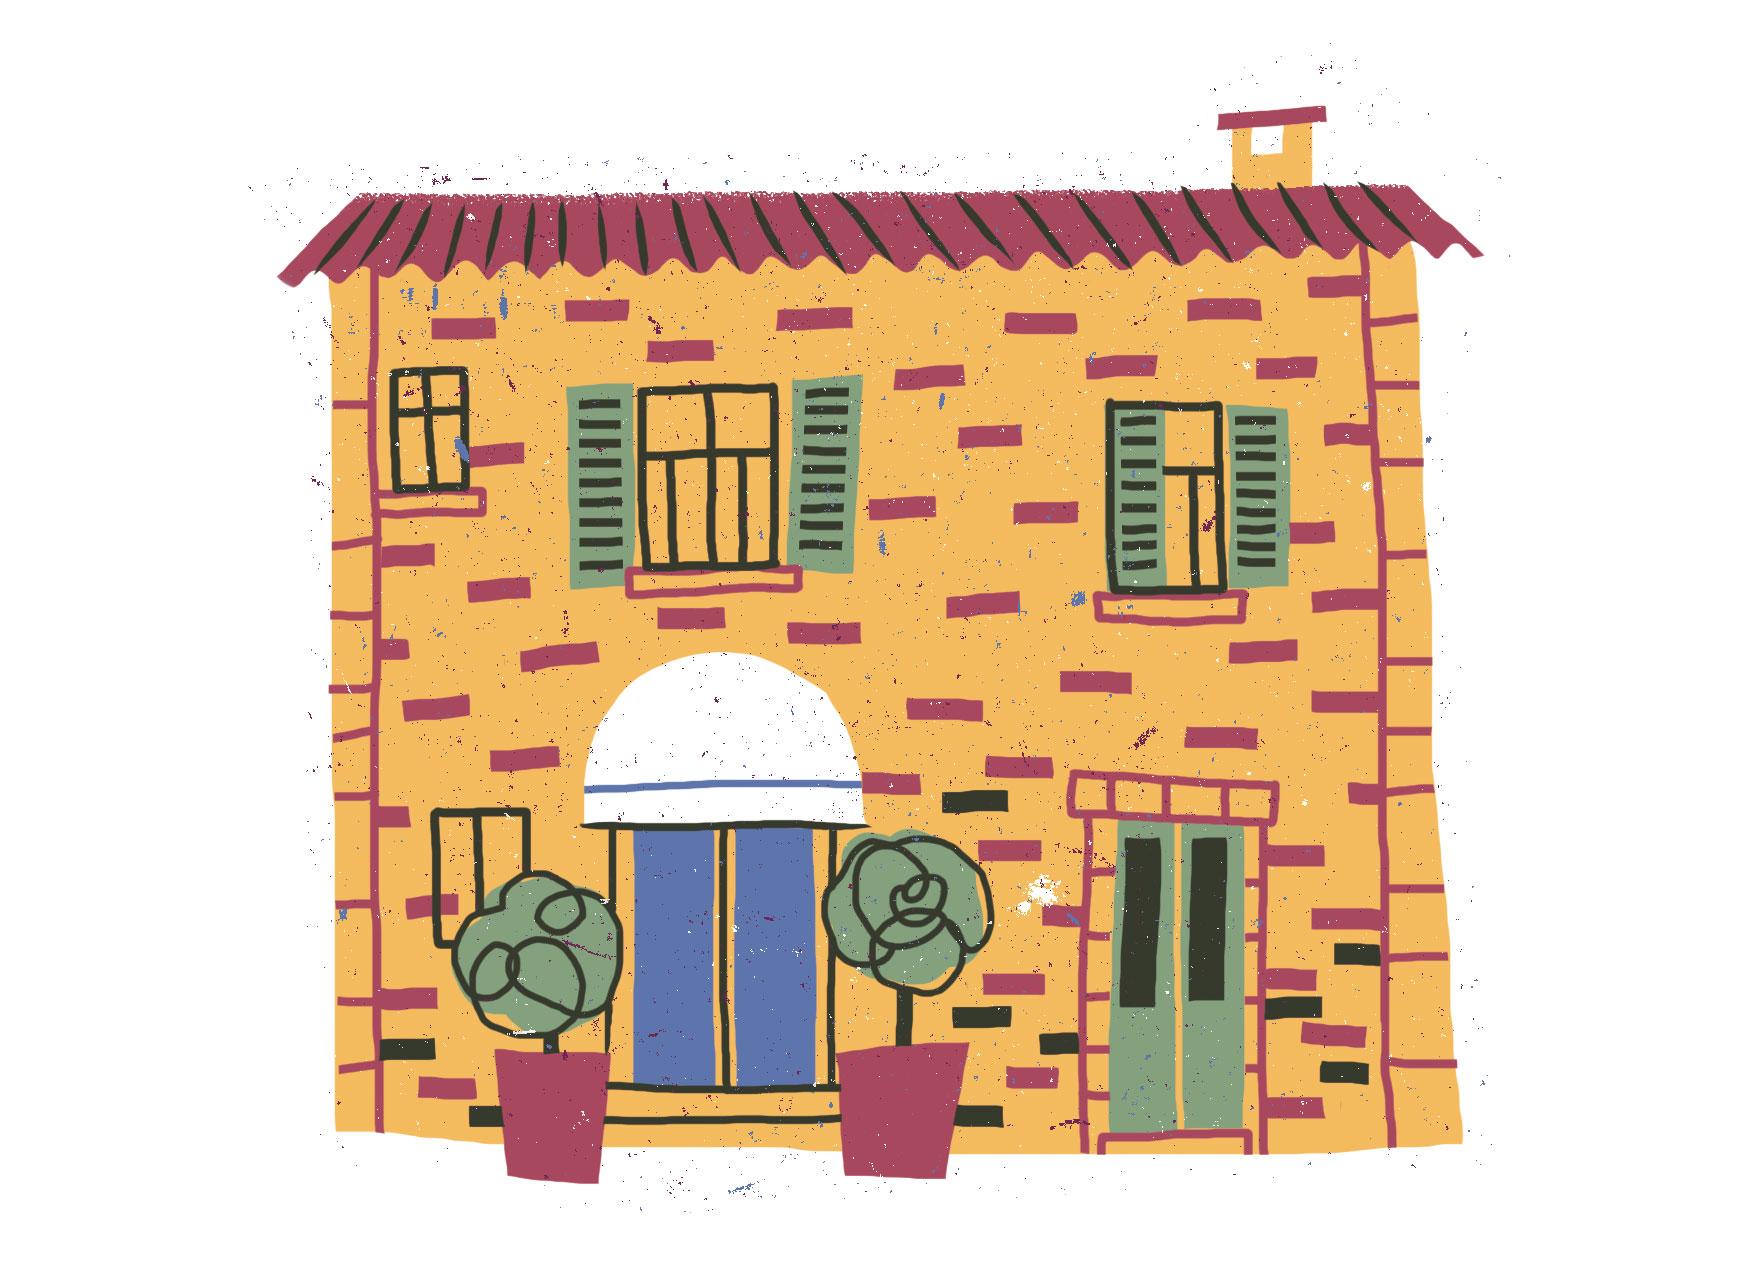 La Grotta Restaurant illustration